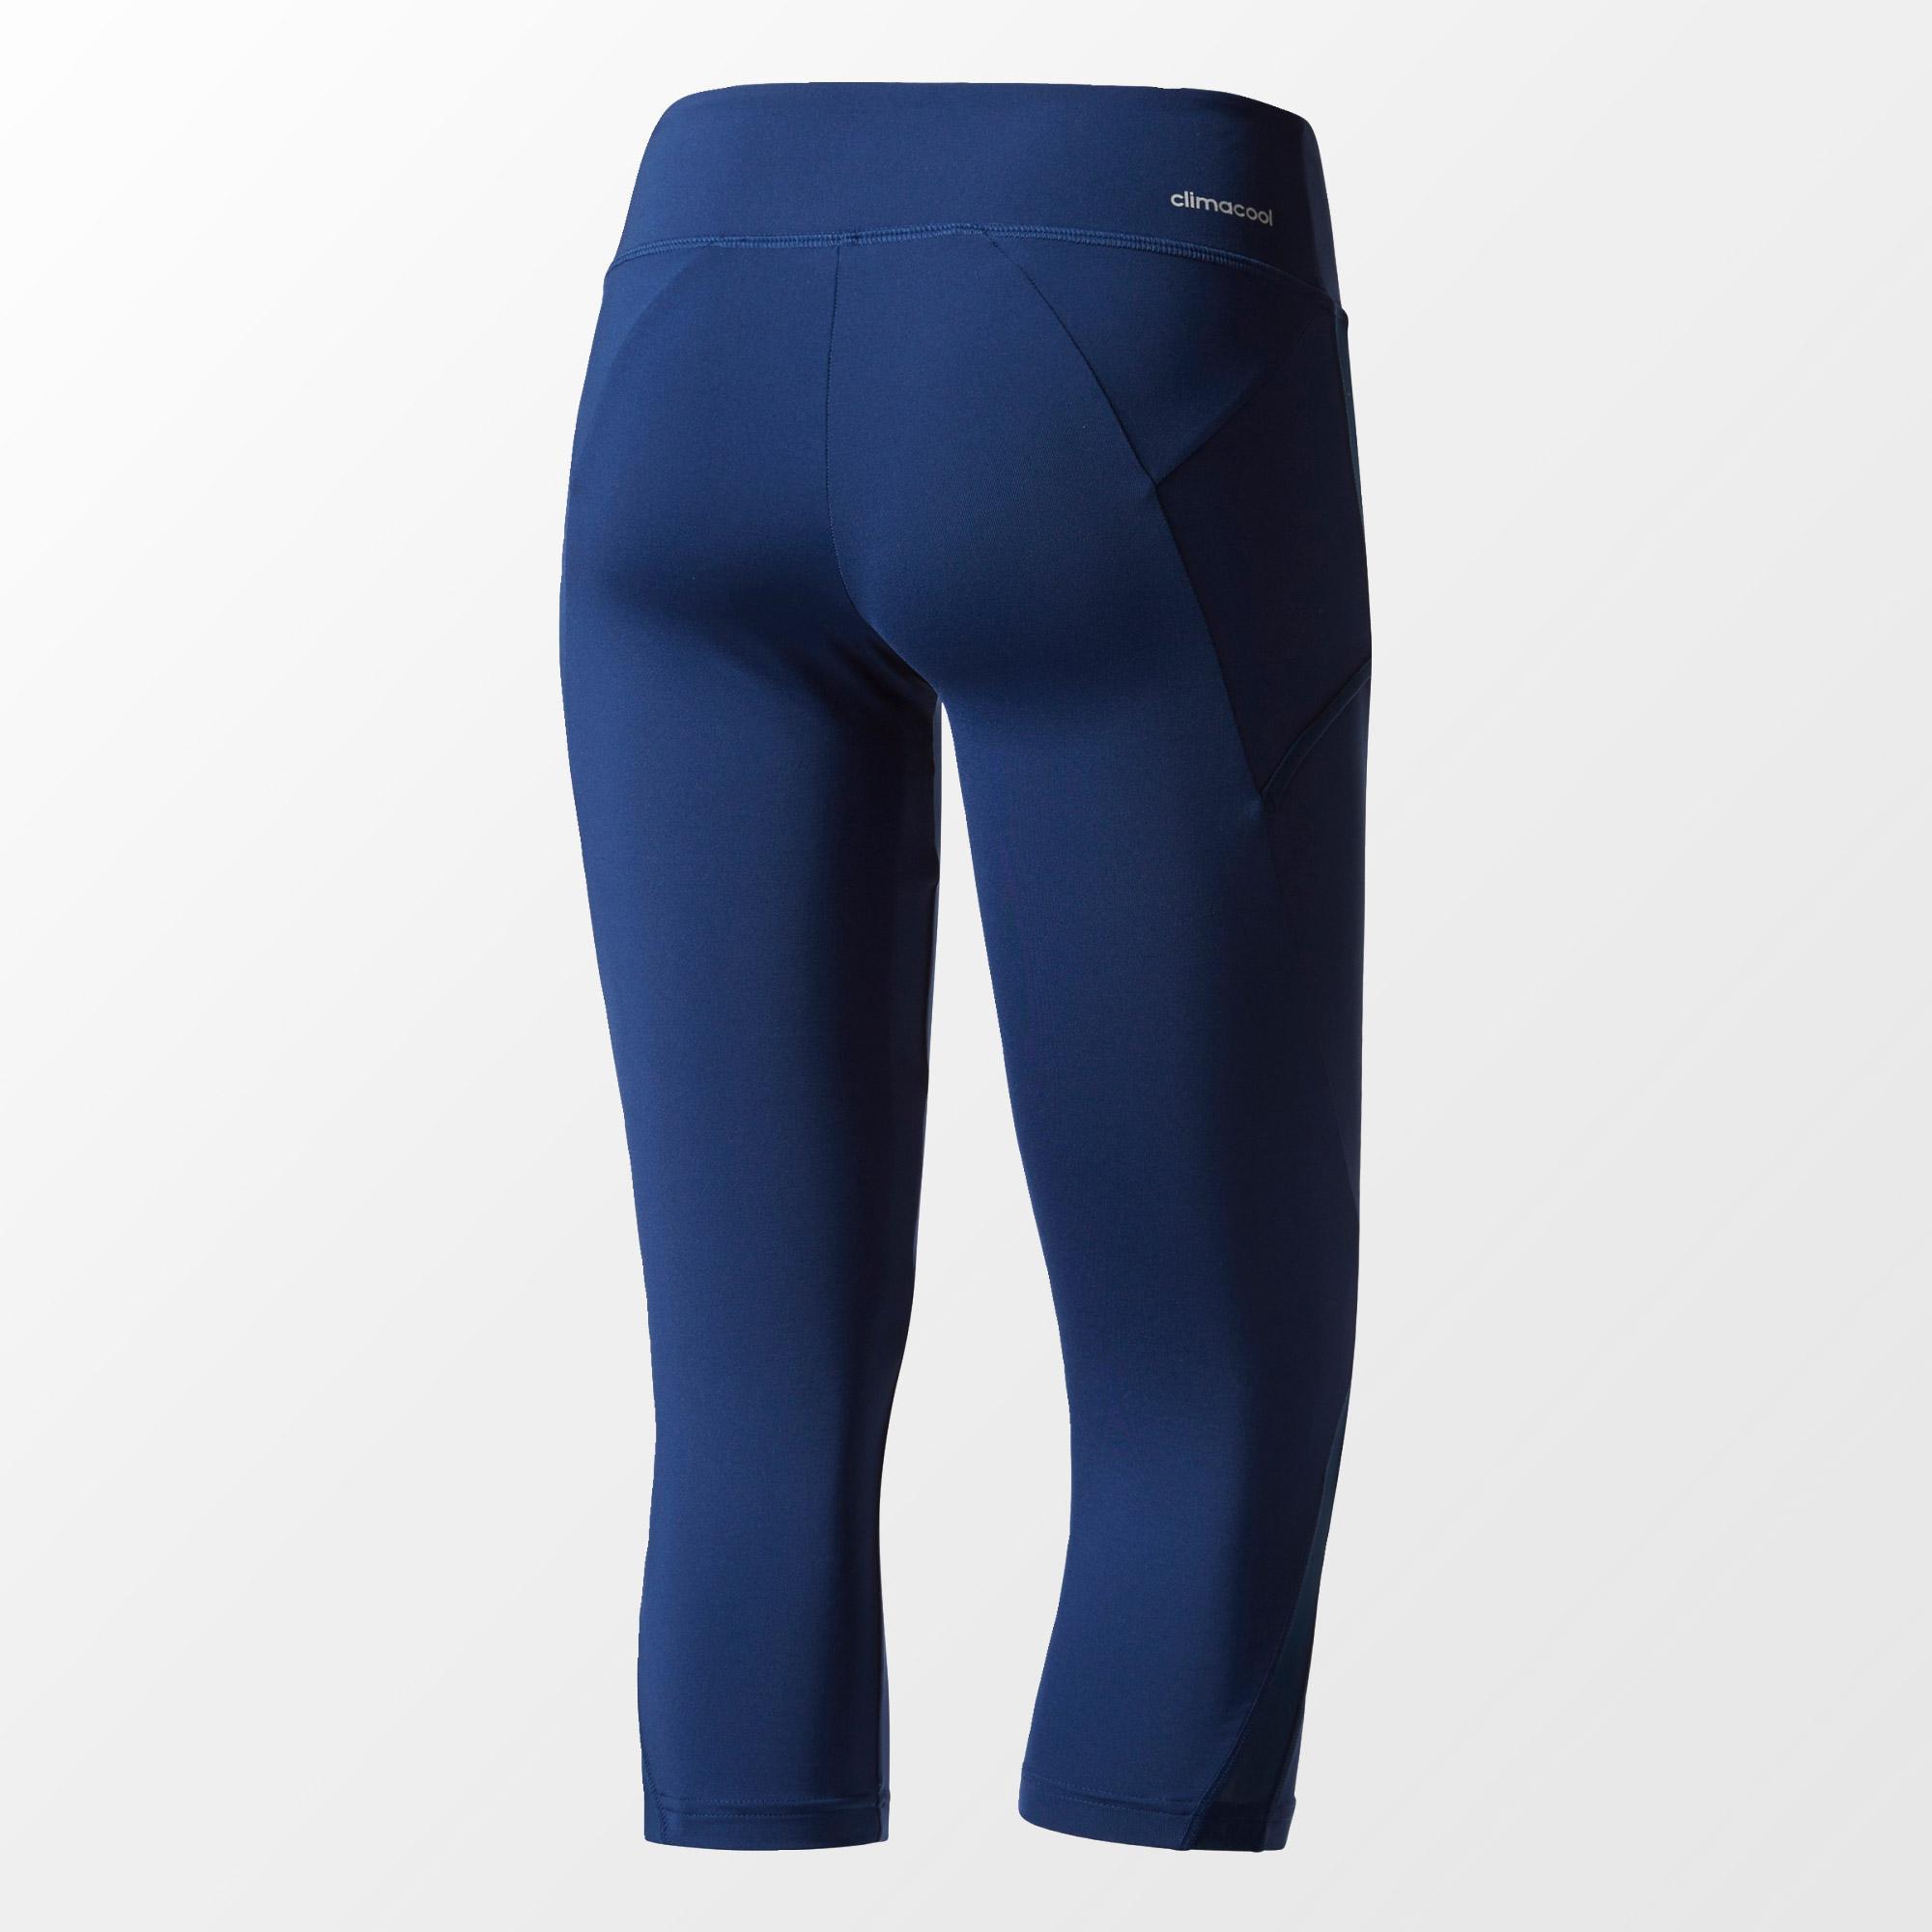 adidas climacool leggings